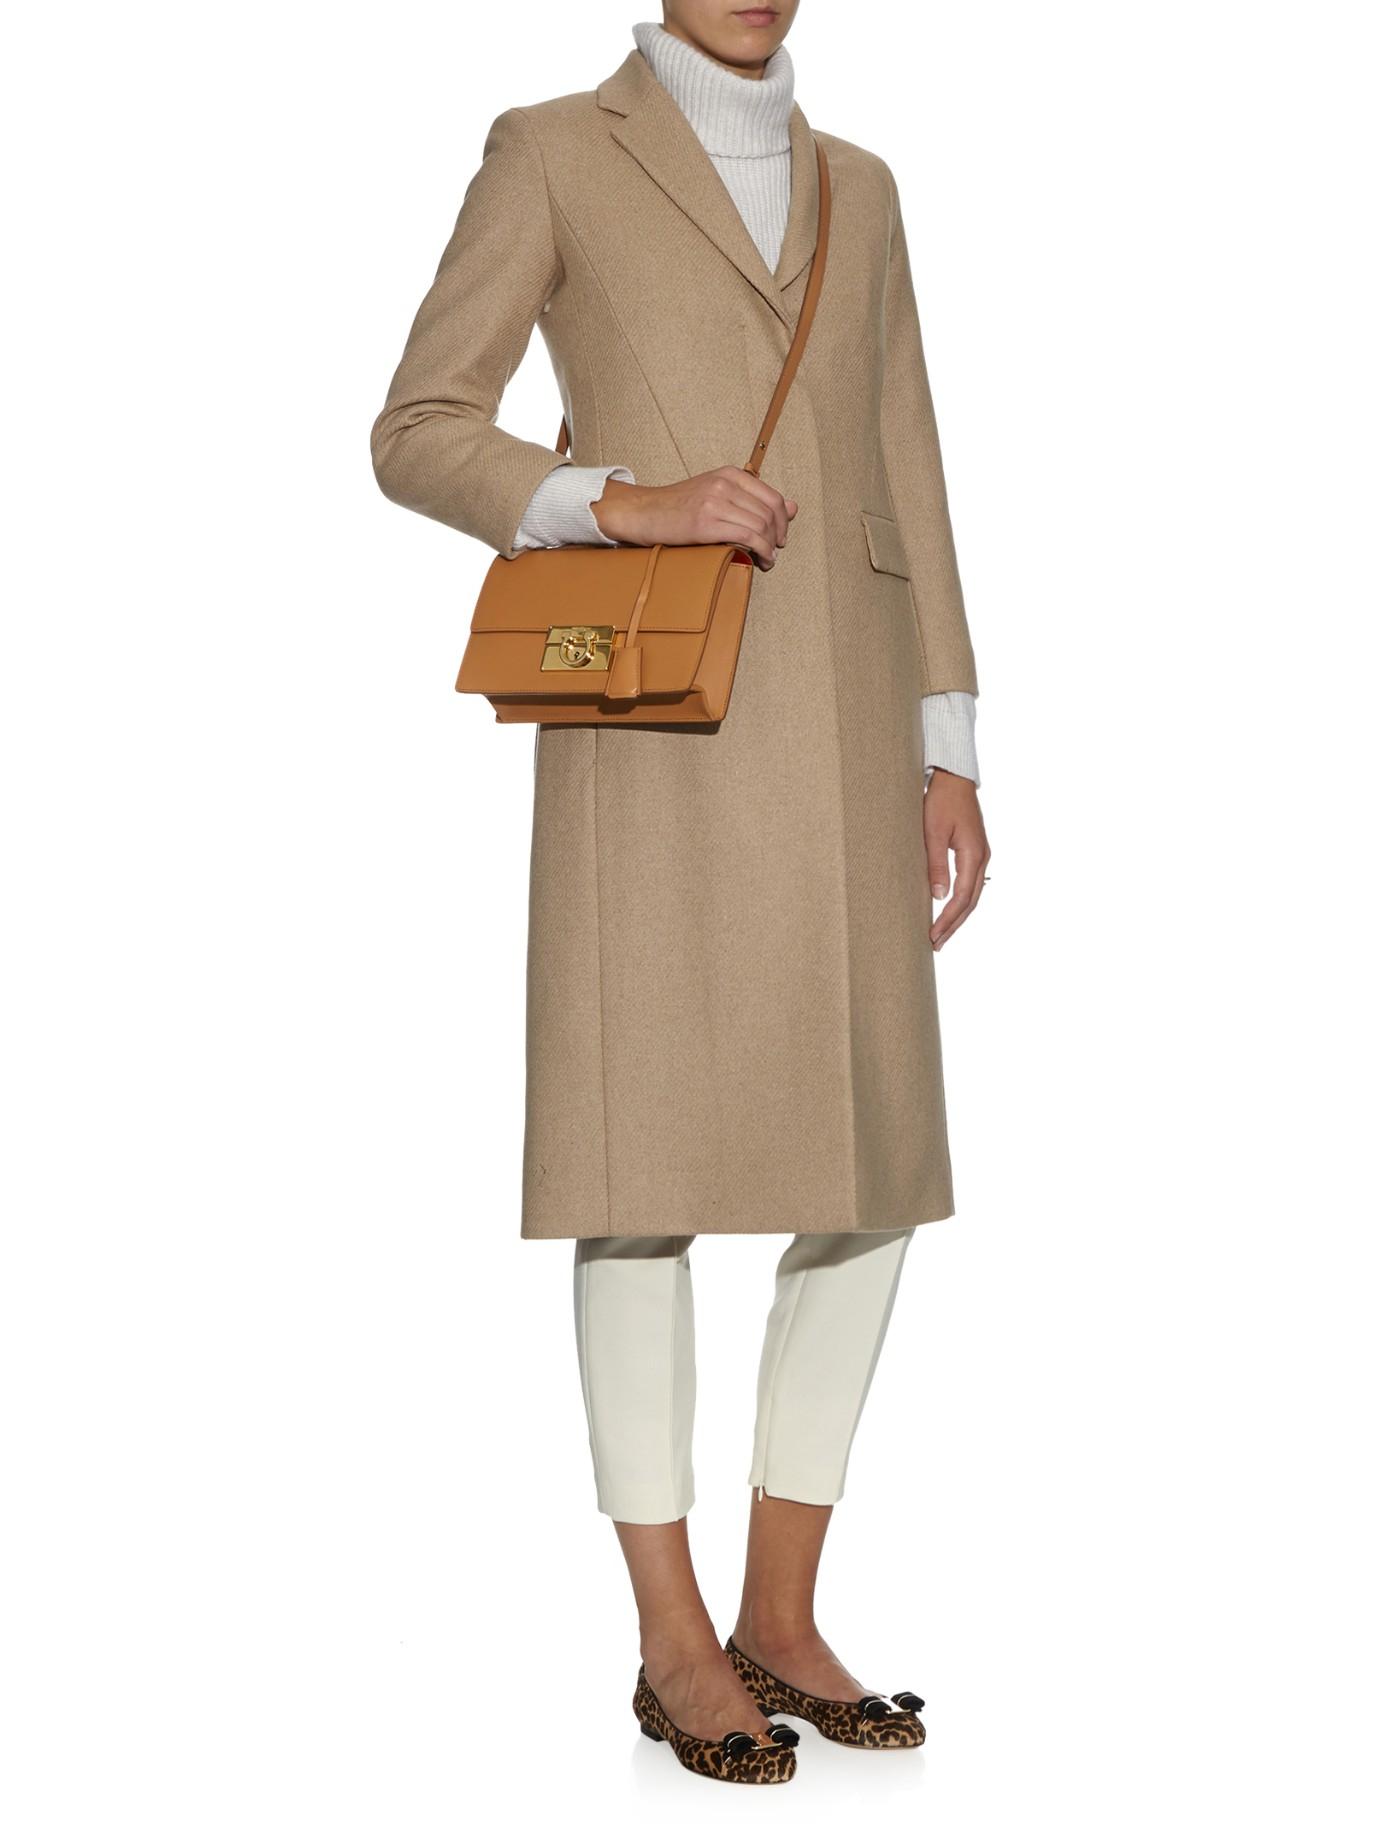 Lyst - Ferragamo Aileen Medium Leather Cross-Body Bag in Brown 95563558b94e1